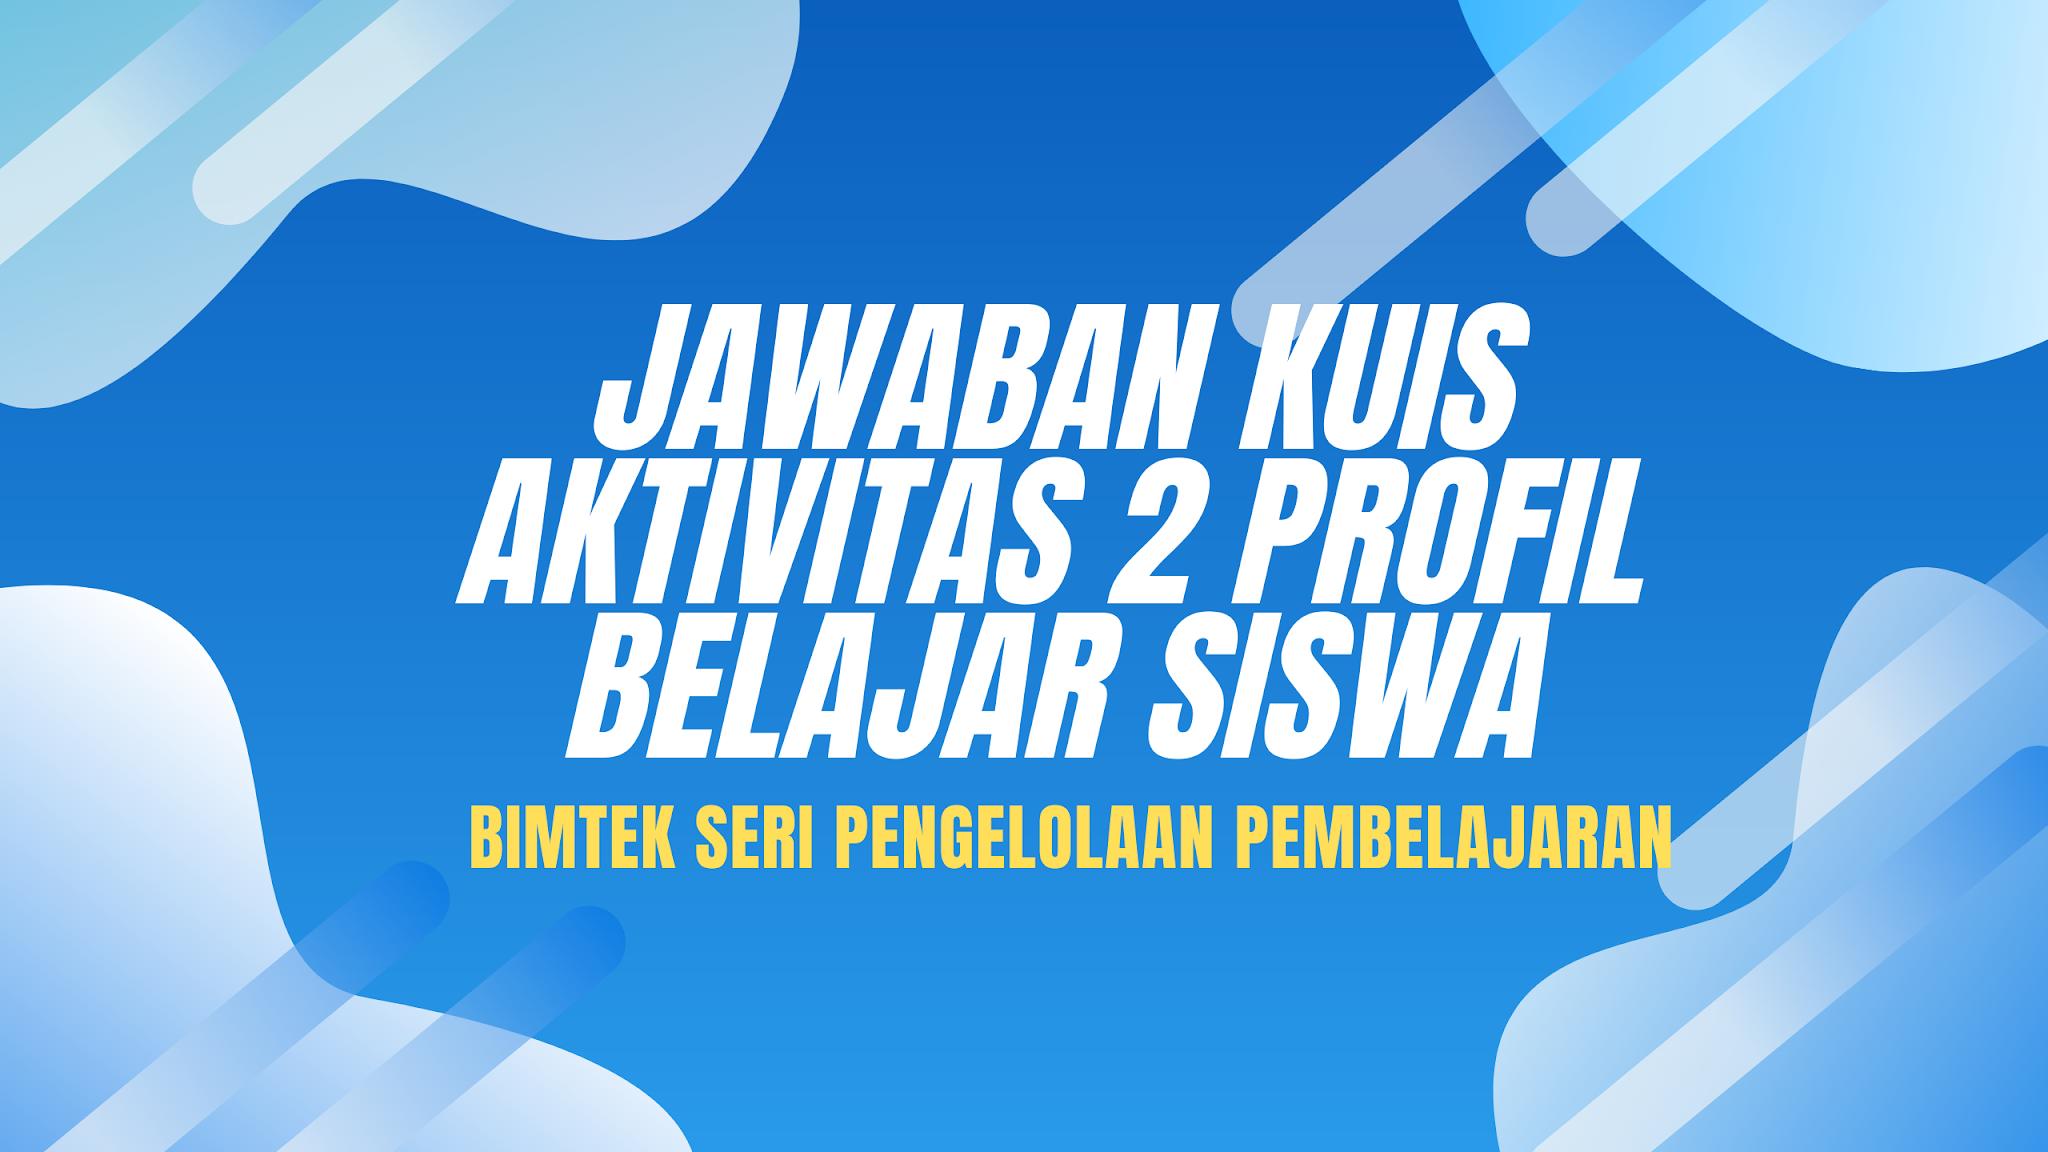 gambar Jawaban Kuis Aktivitas 2 Profil belajar Siswa